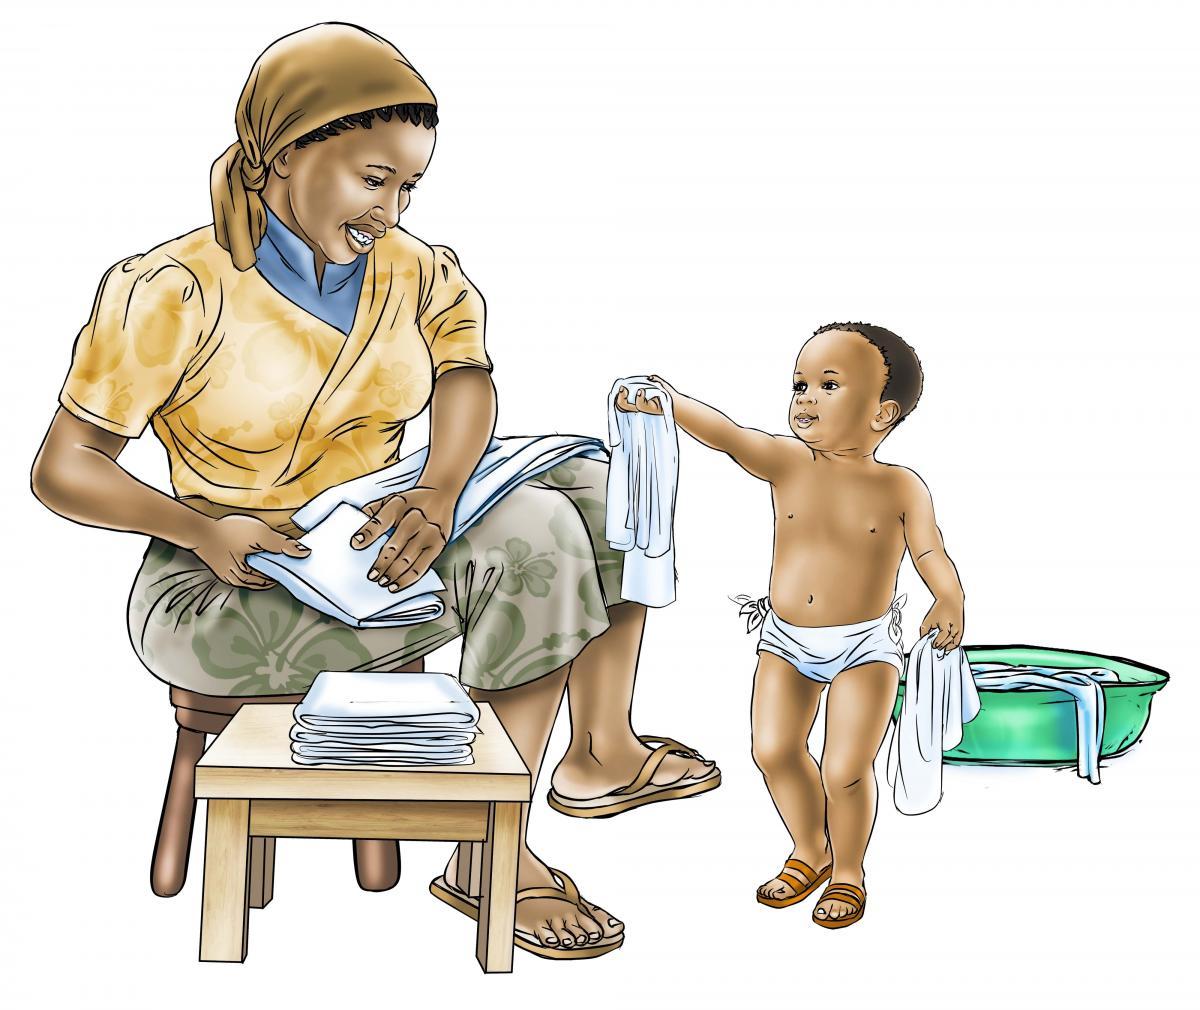 Hygiene - Changing diapers - 05 - Sierra Leone